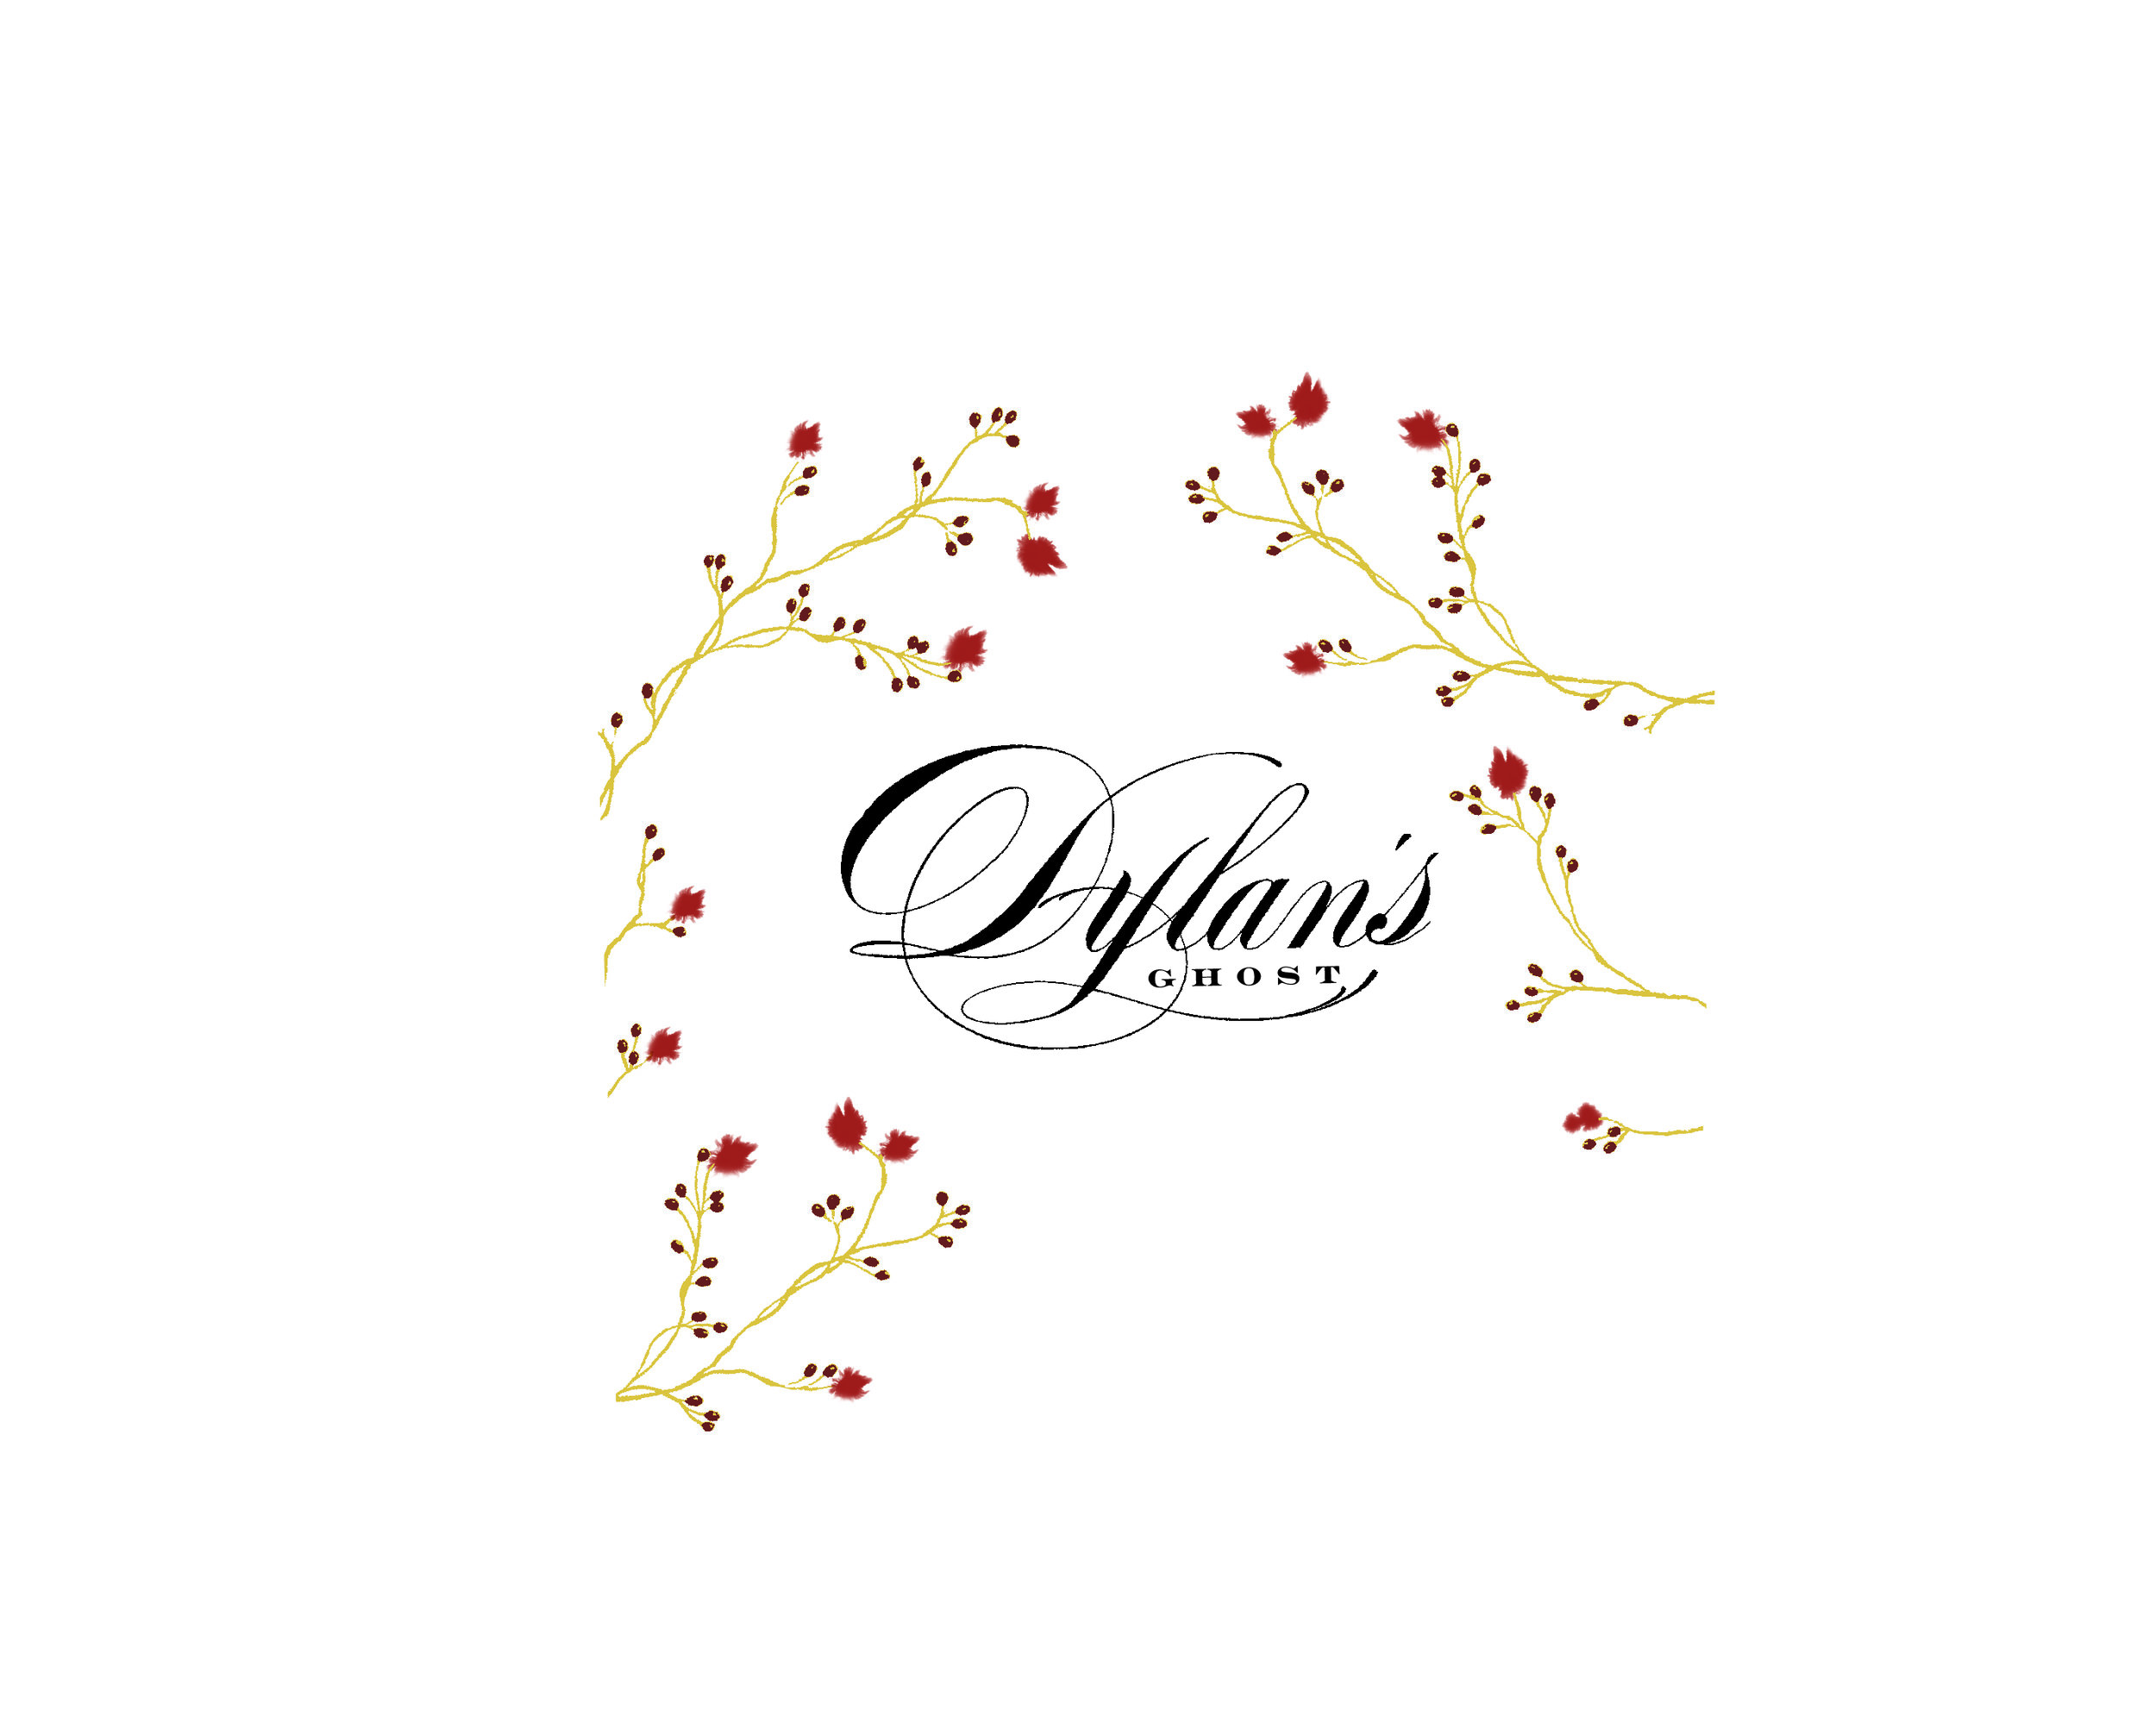 Dylan's Ghost_logo 2.jpg